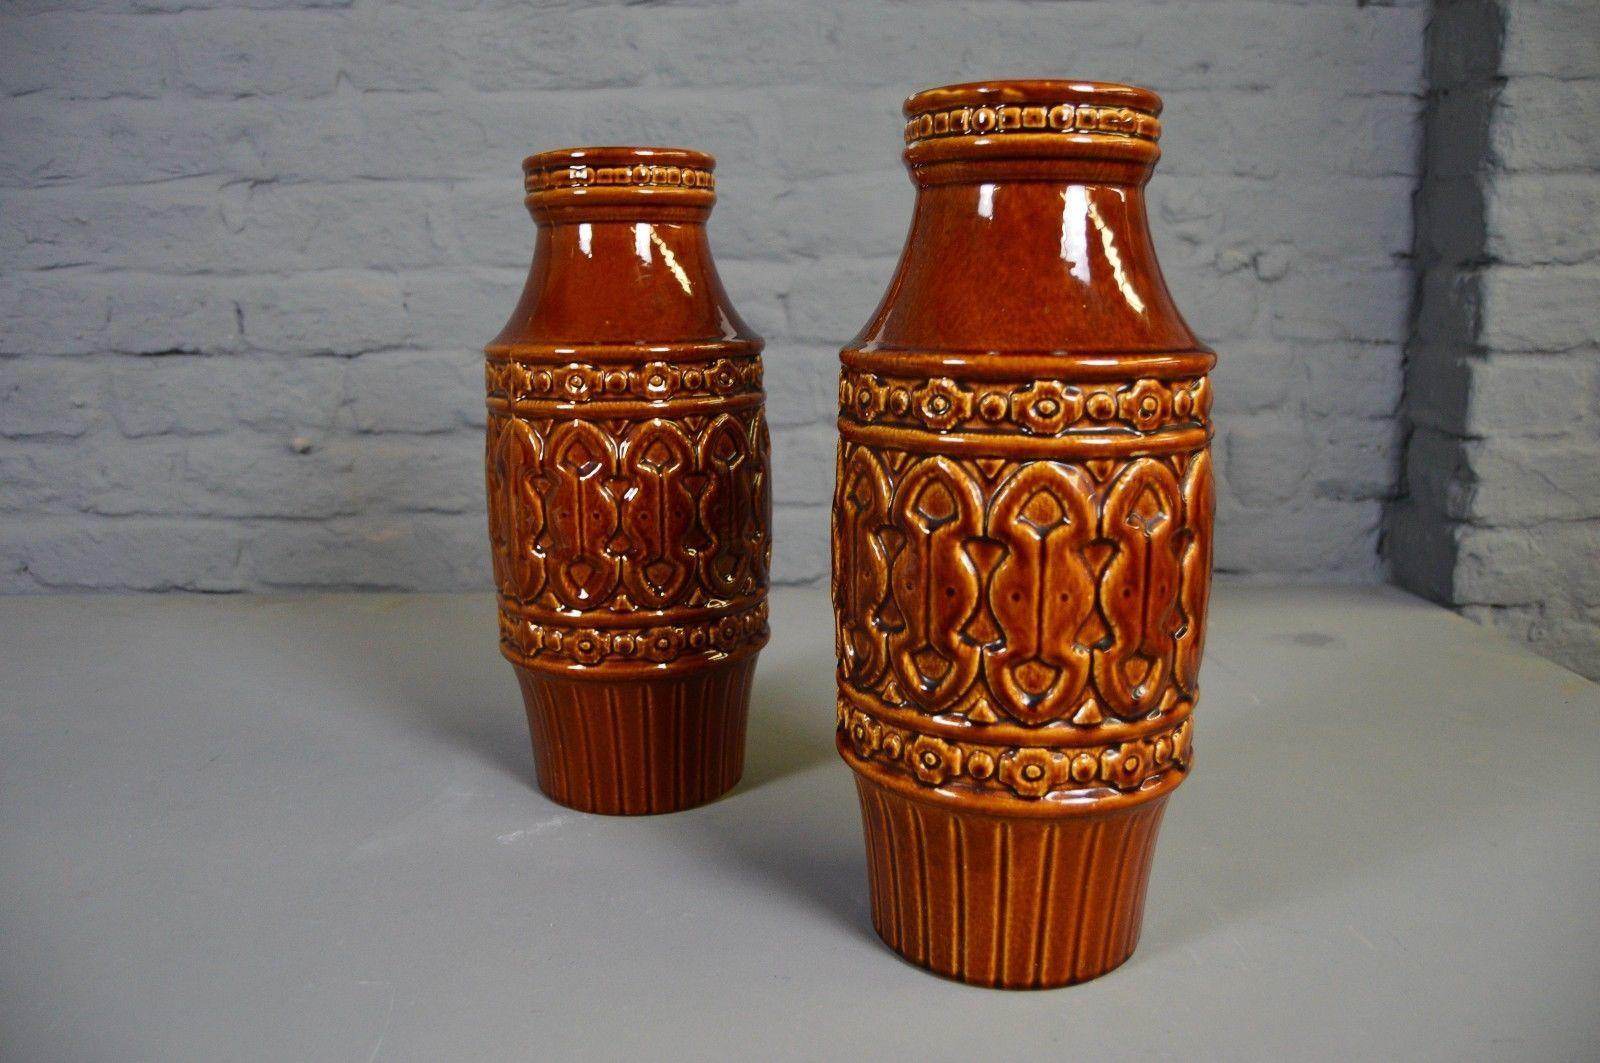 retro-vintage-mid-century-price-kensington-coliseum-large-vase-brown